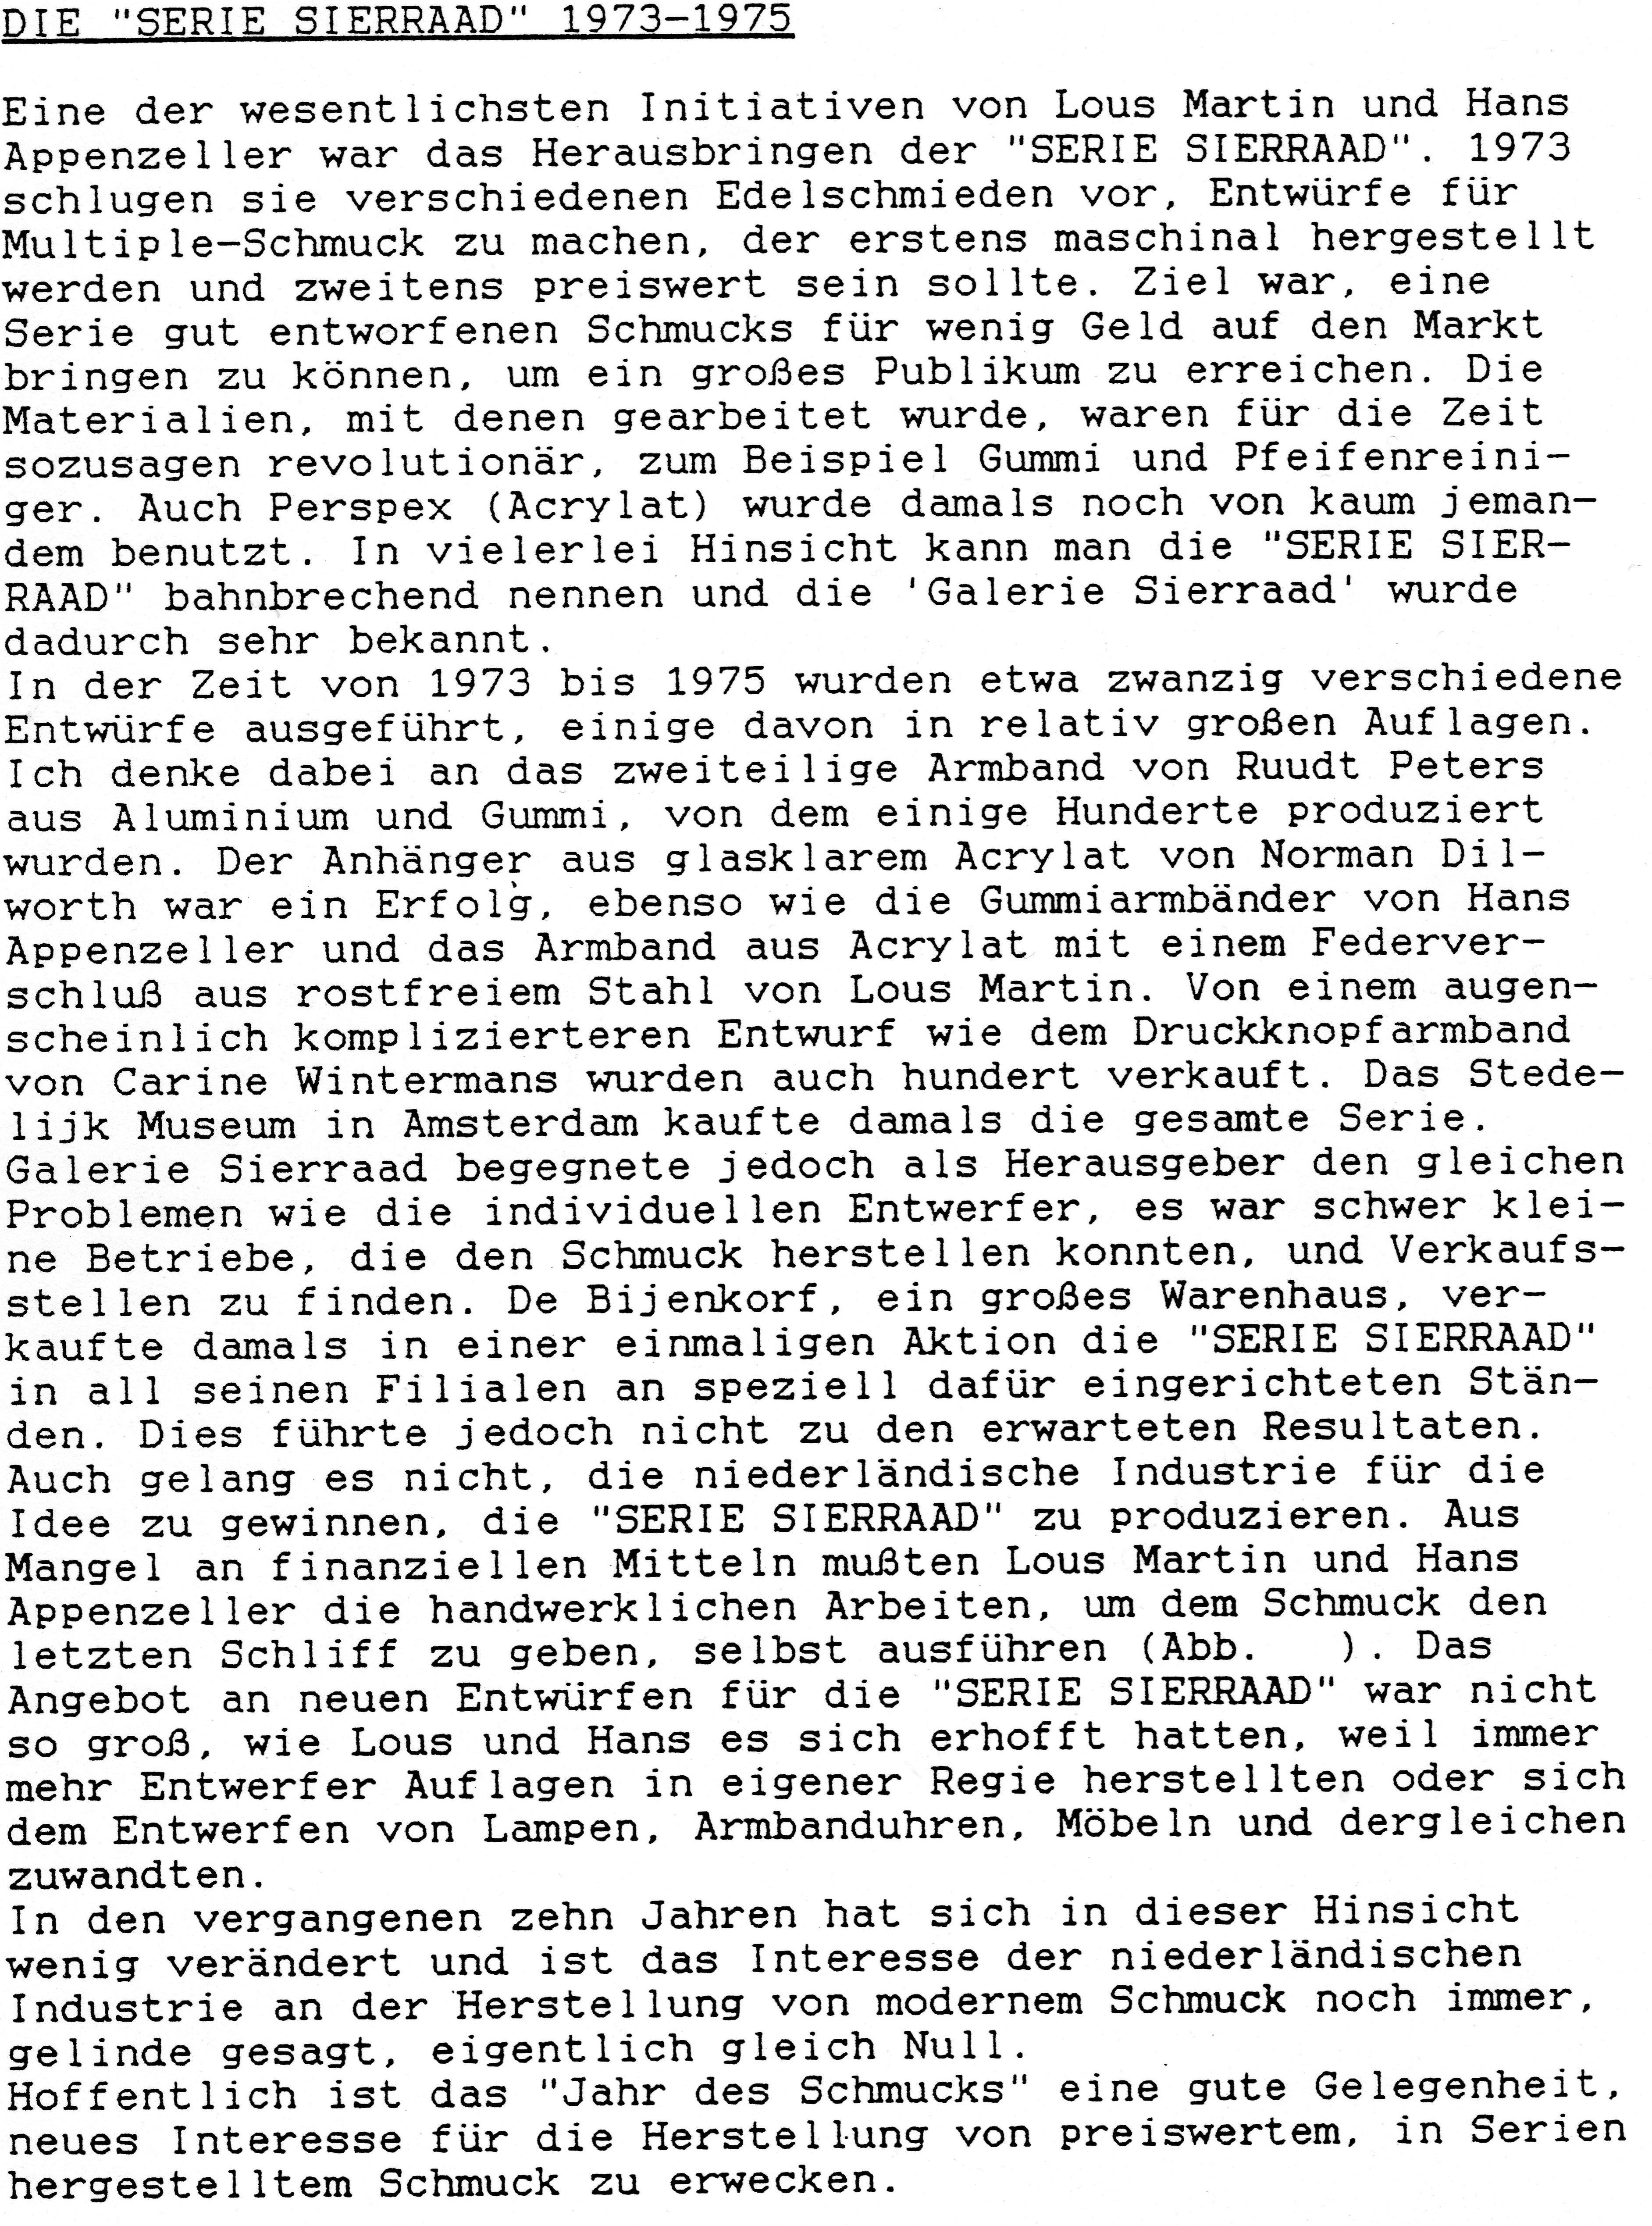 Duitse tekst over Serie sieraad, typoscript